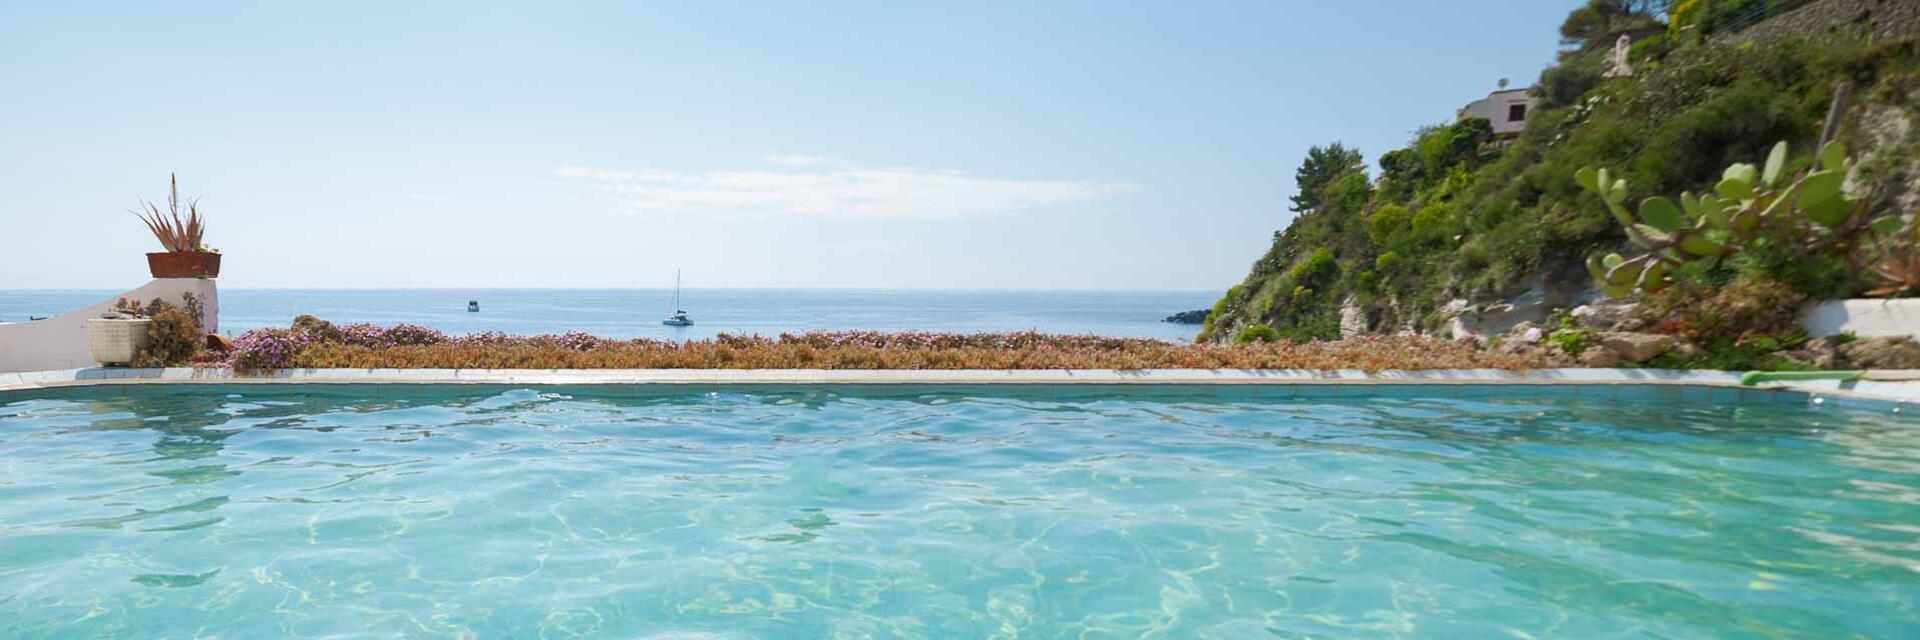 hotelcasarosaterme de schwimmbecken 002